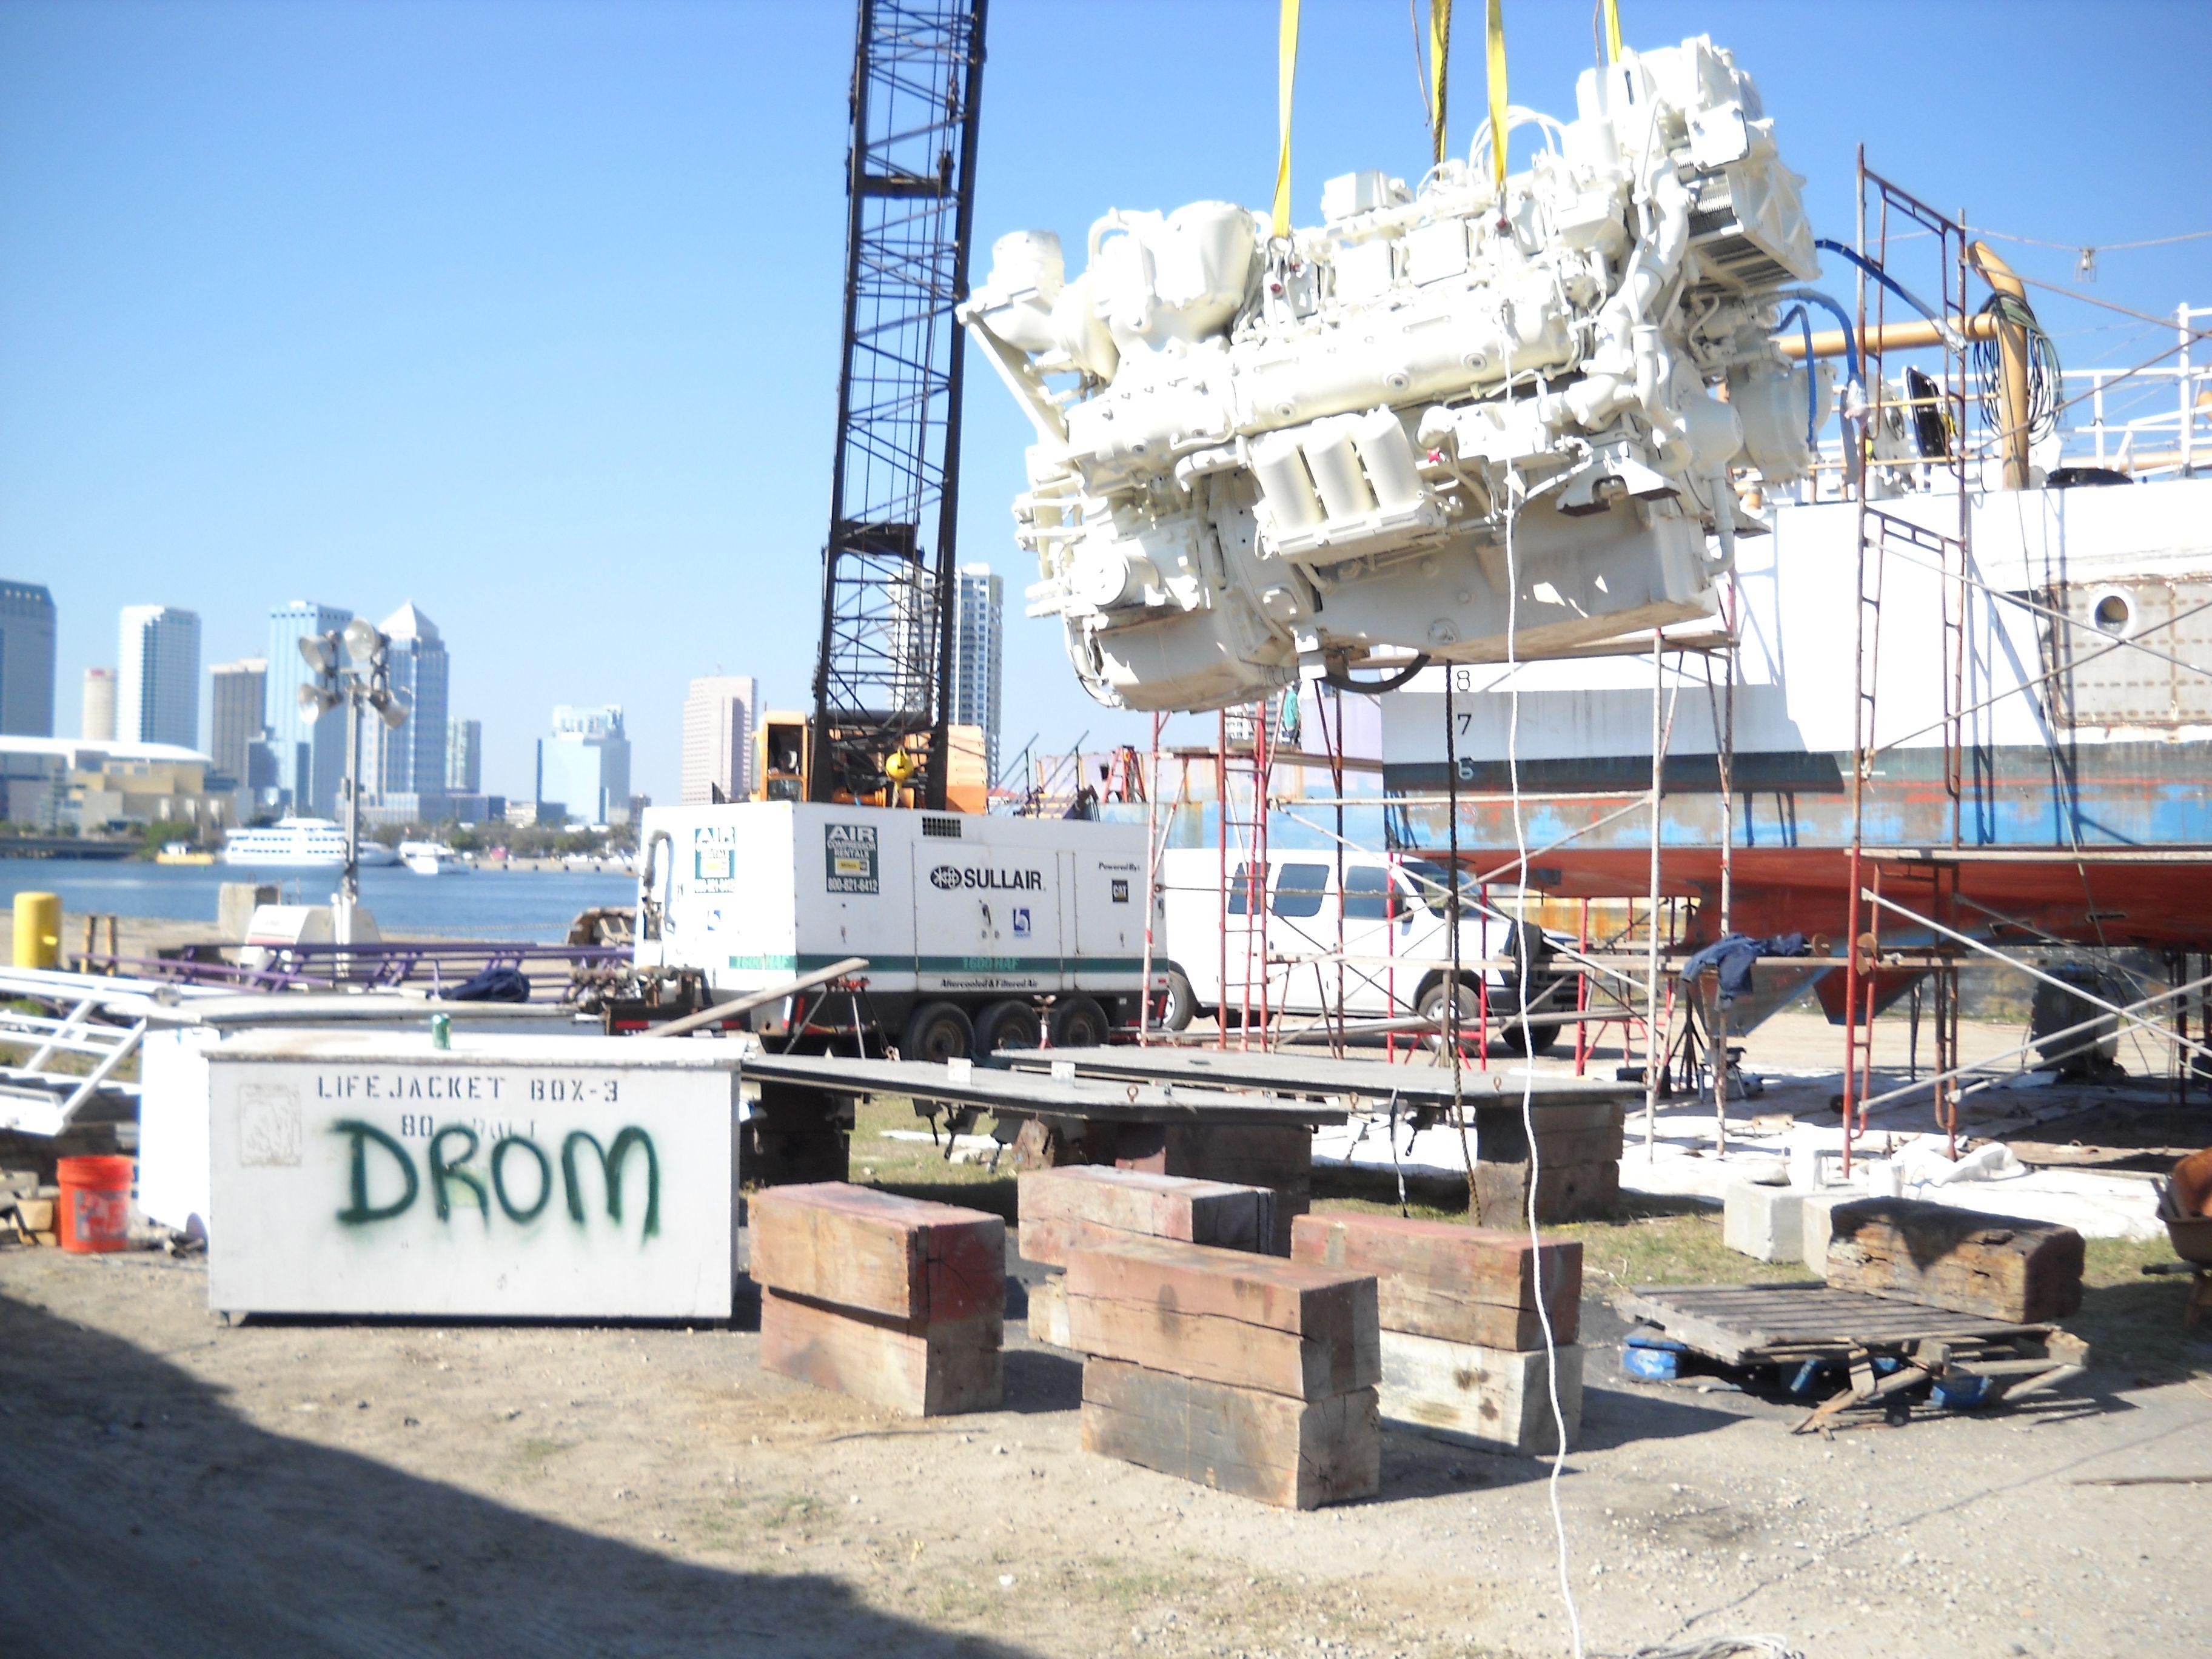 Amberjack main engine removalreplacement coast guard